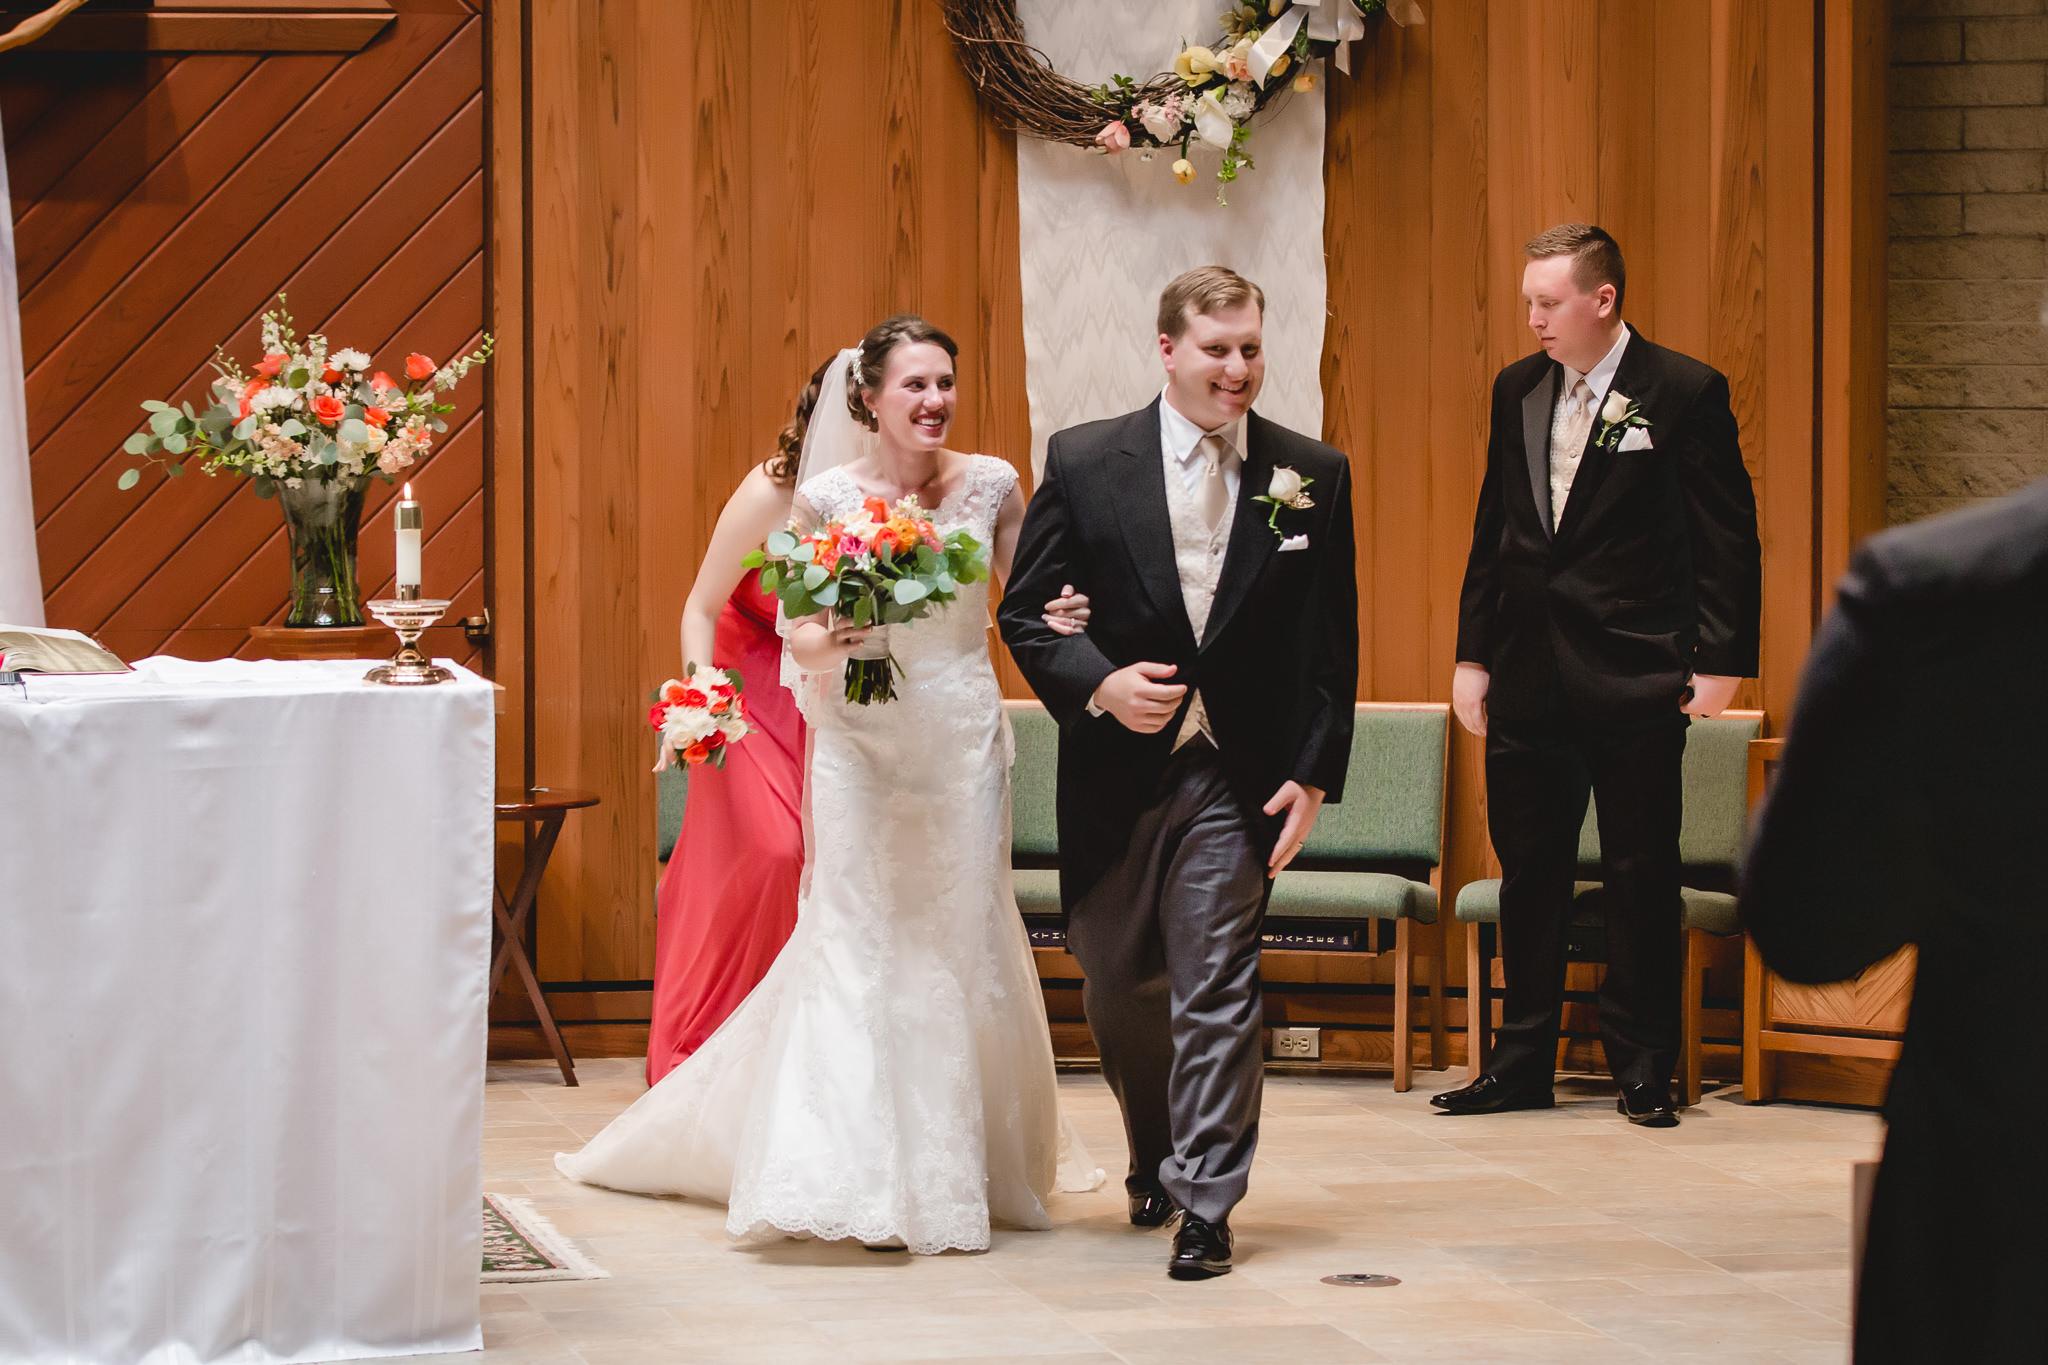 Newlyweds at St. John Neumann Church in Pittsburgh PA wedding